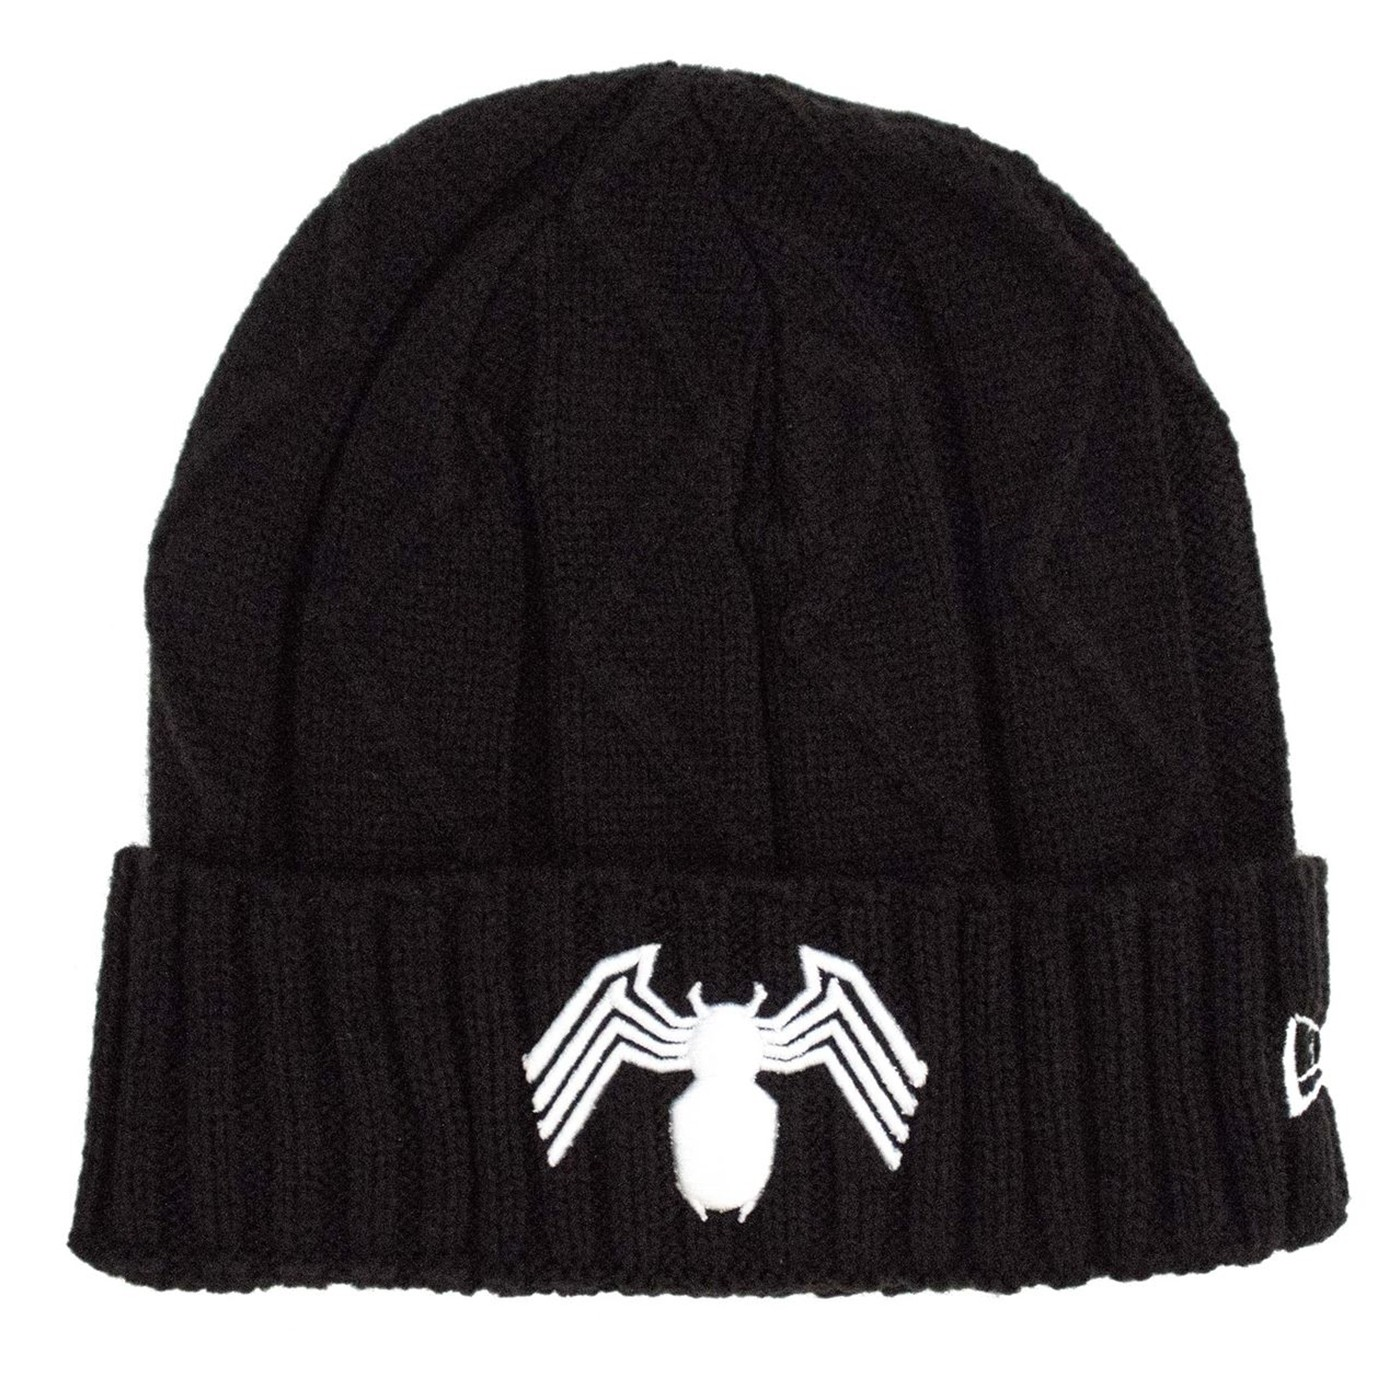 Venom Tentacle Weave Unisex Knit Beanie